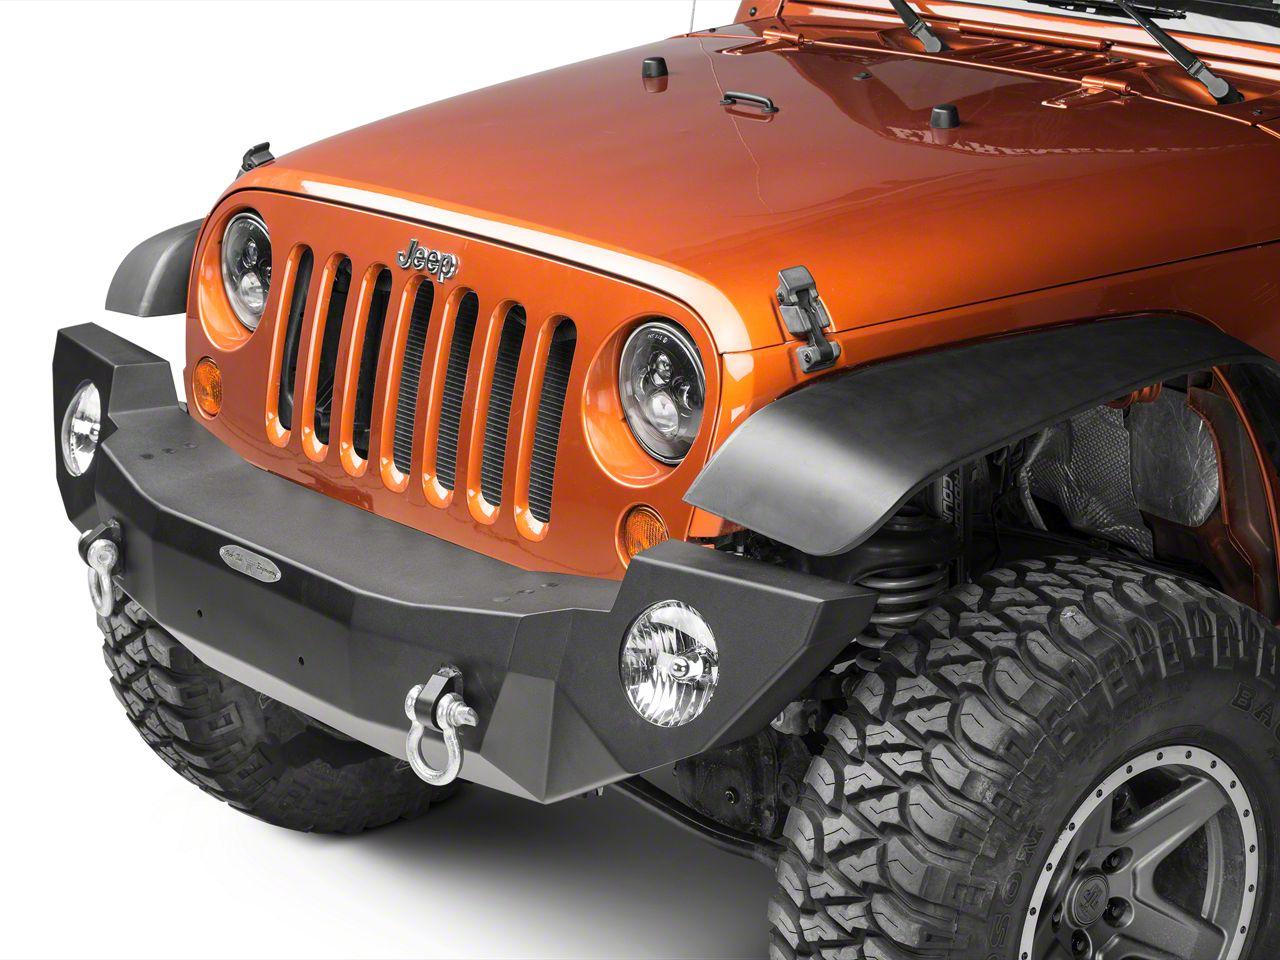 Rock-Slide Engineering Rigid Series Full Front Aluminum Bumper w/o Winch Plate (07-18 Jeep Wrangler JK)